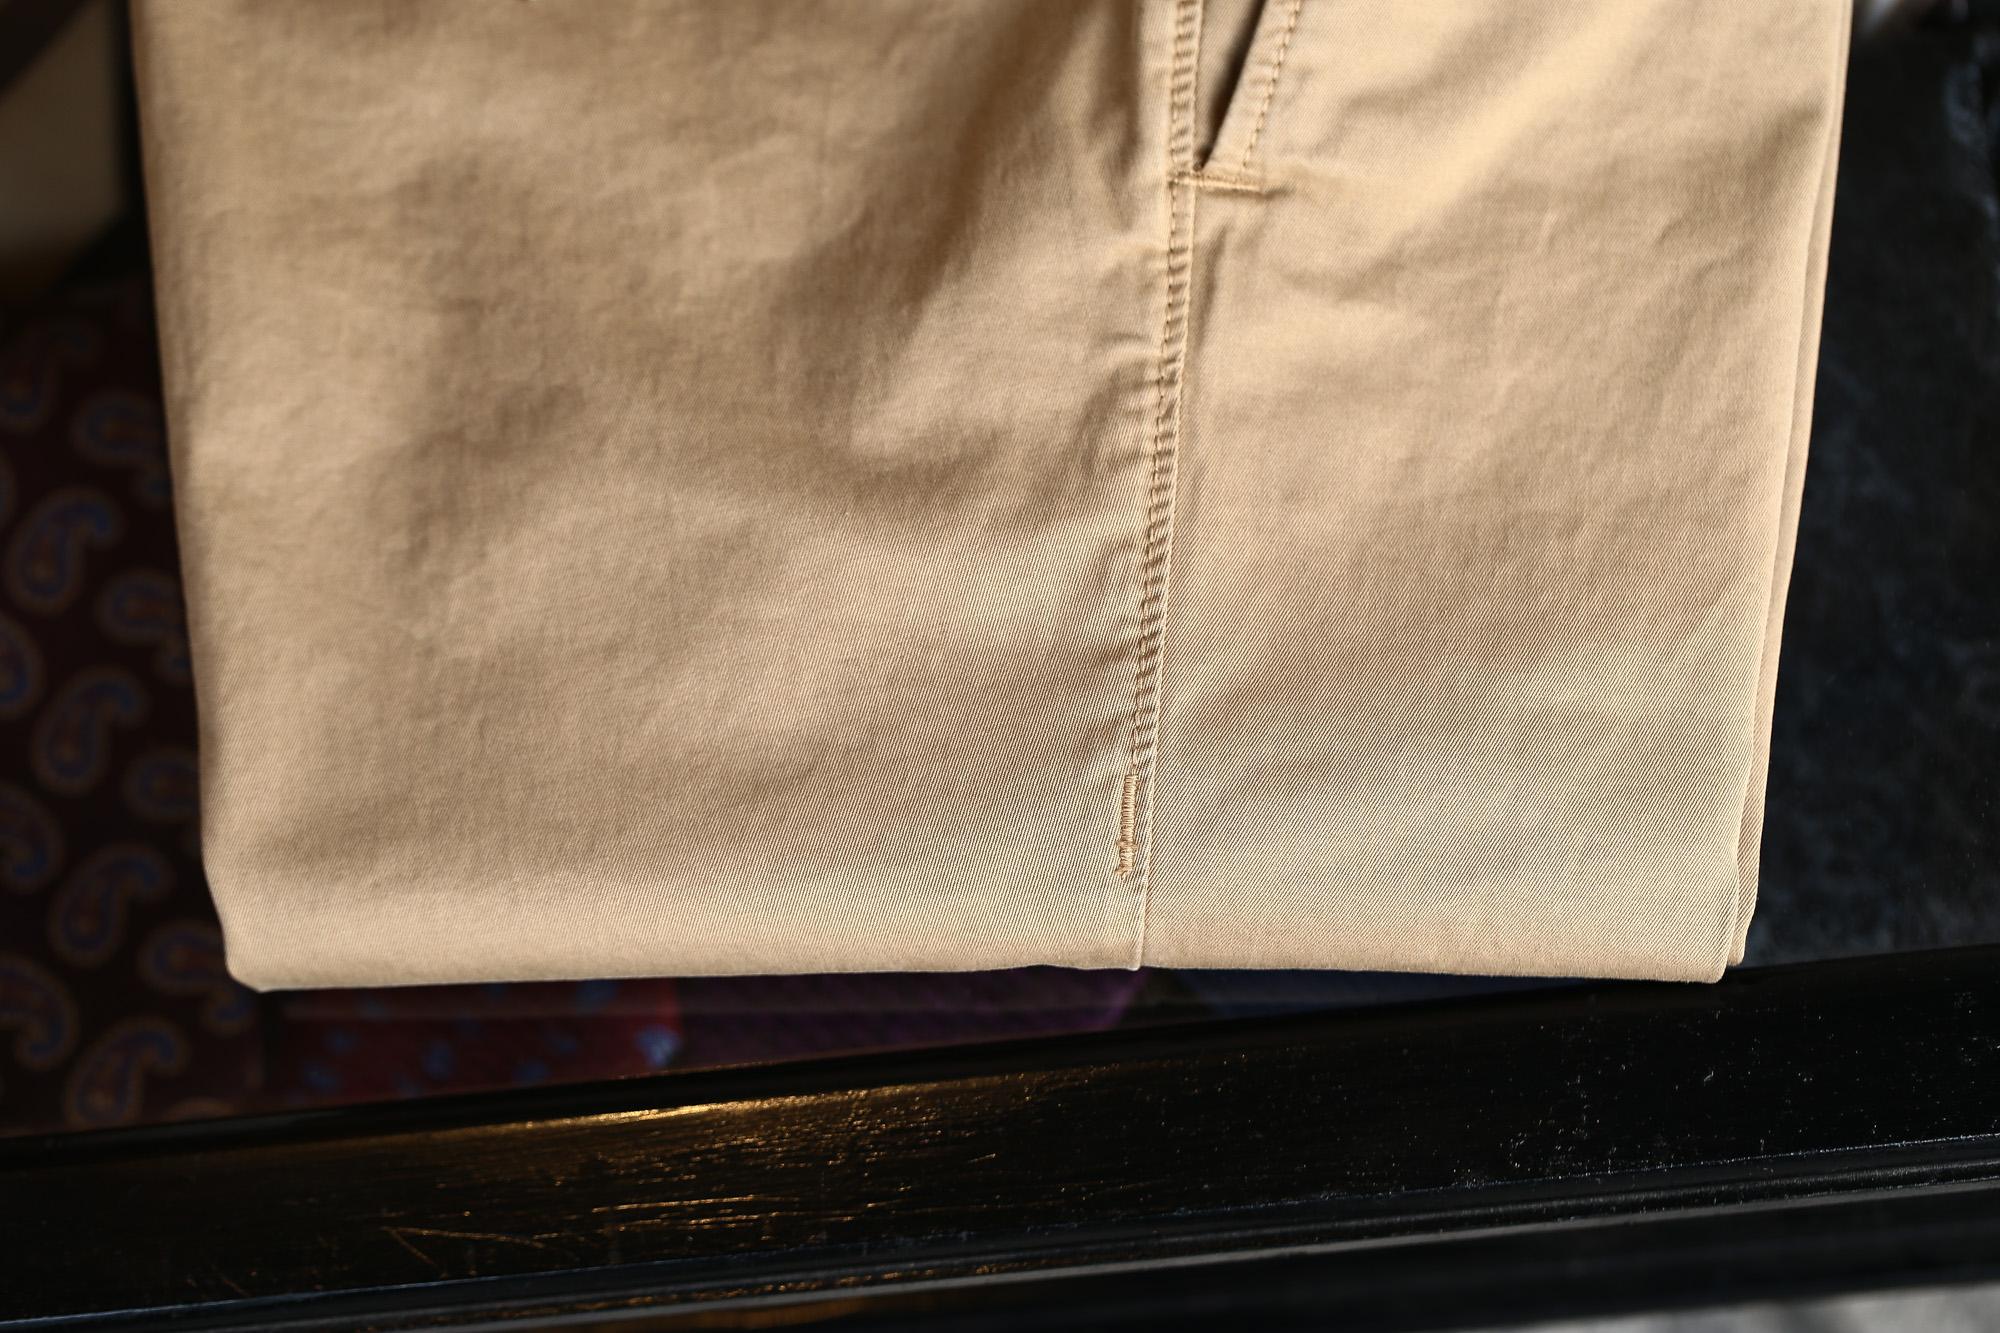 INCOTEX SLACKS(インコテックススラックス) 1ST603 SLIM FIT G.D. STRETCH GABCHINO チノパンツ BEIGE (ベージュ・512) 2018 春夏新作 incotex incotexslacks インコテックス チノ 愛知 名古屋 Alto e Diritto アルト エ デリット